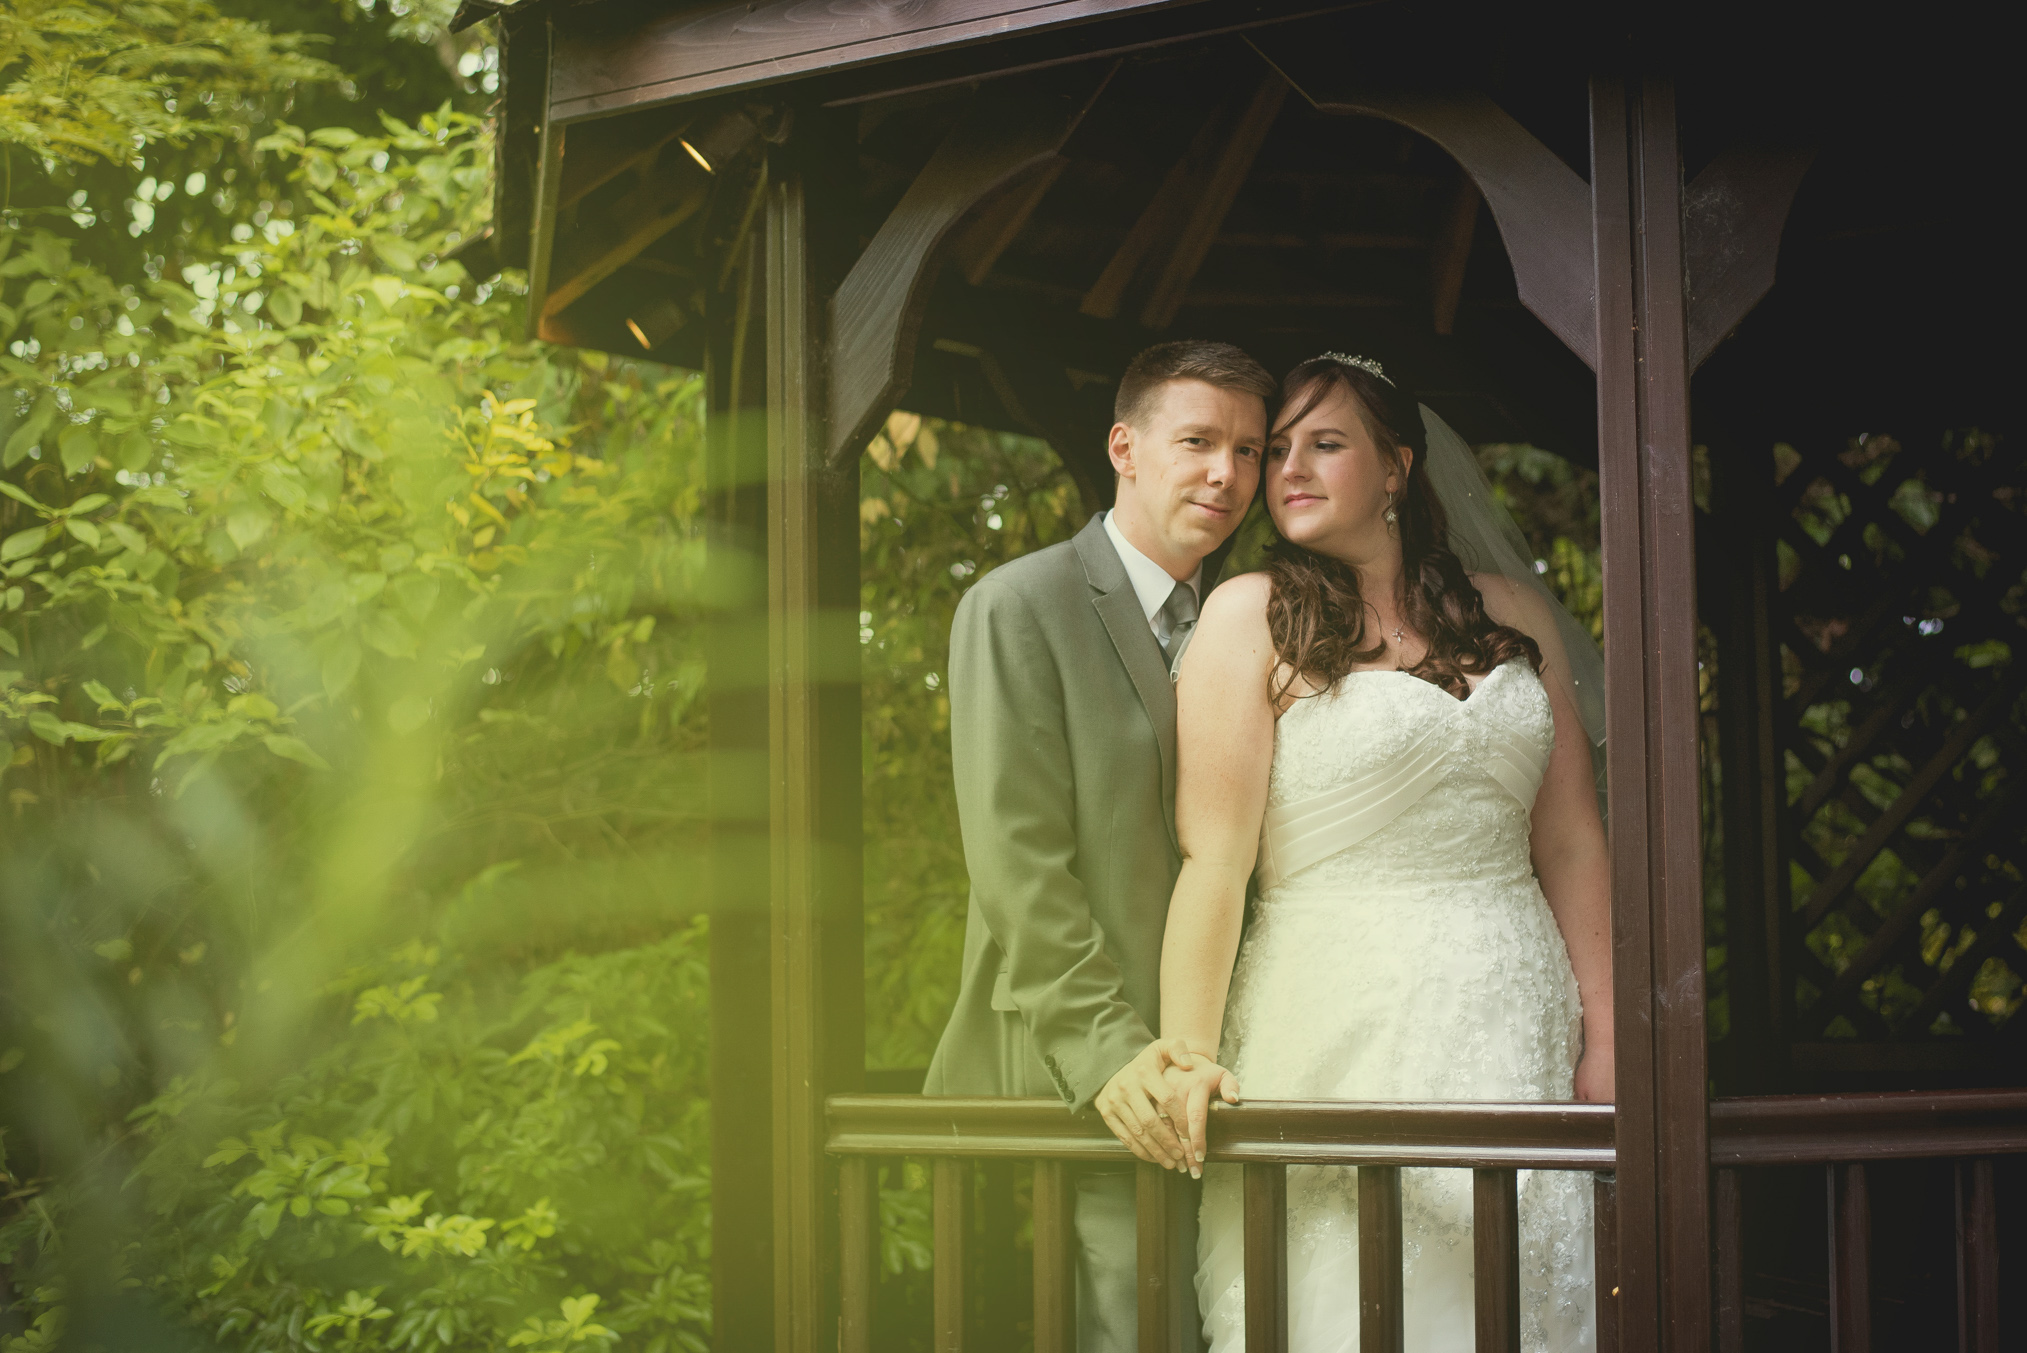 The+Fairlawns+wedding+Aldridge+StLukes+Church-162.jpg